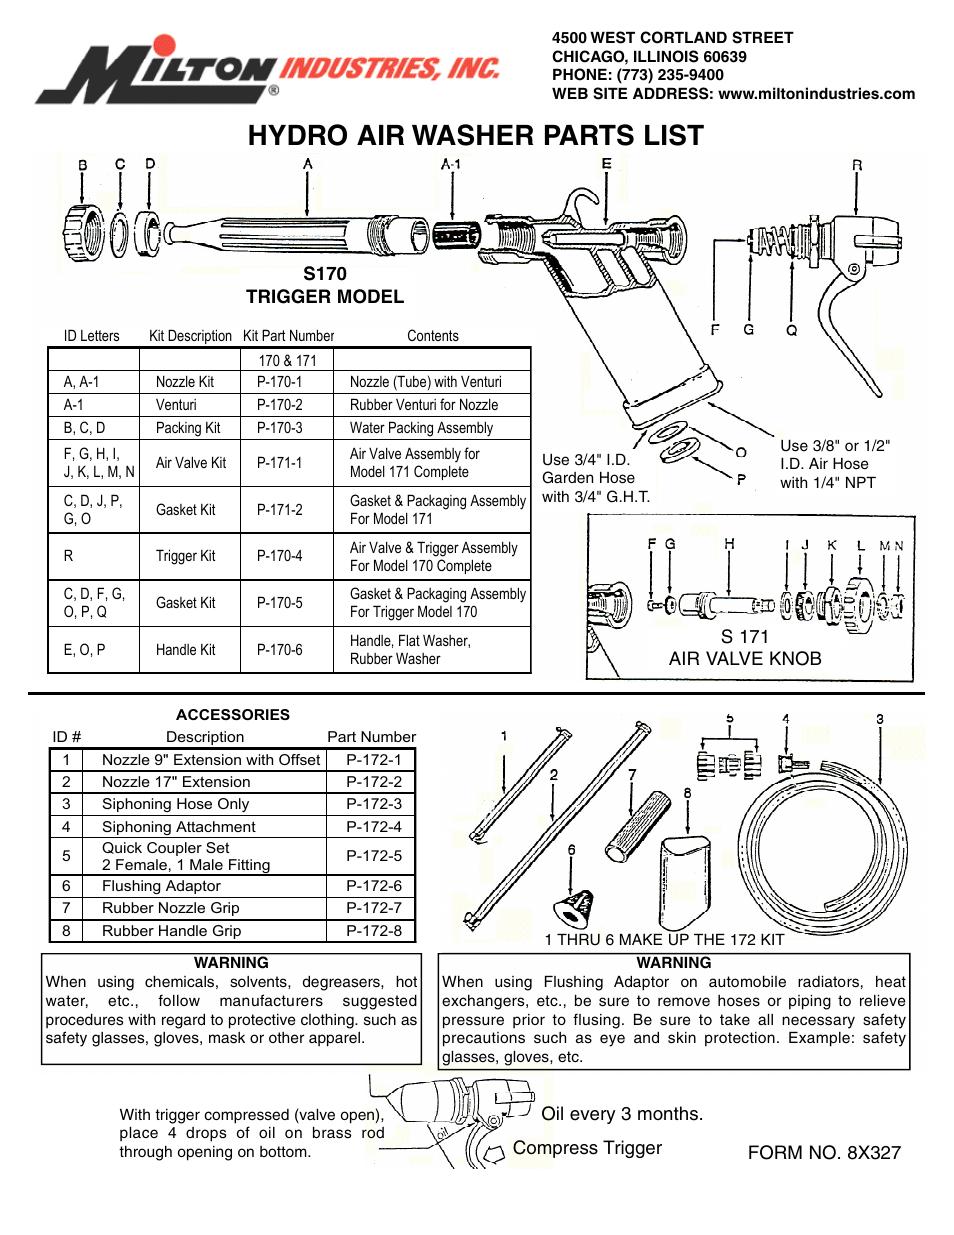 Milton Industries Equipment S170 171 172 Hydro Air Washer